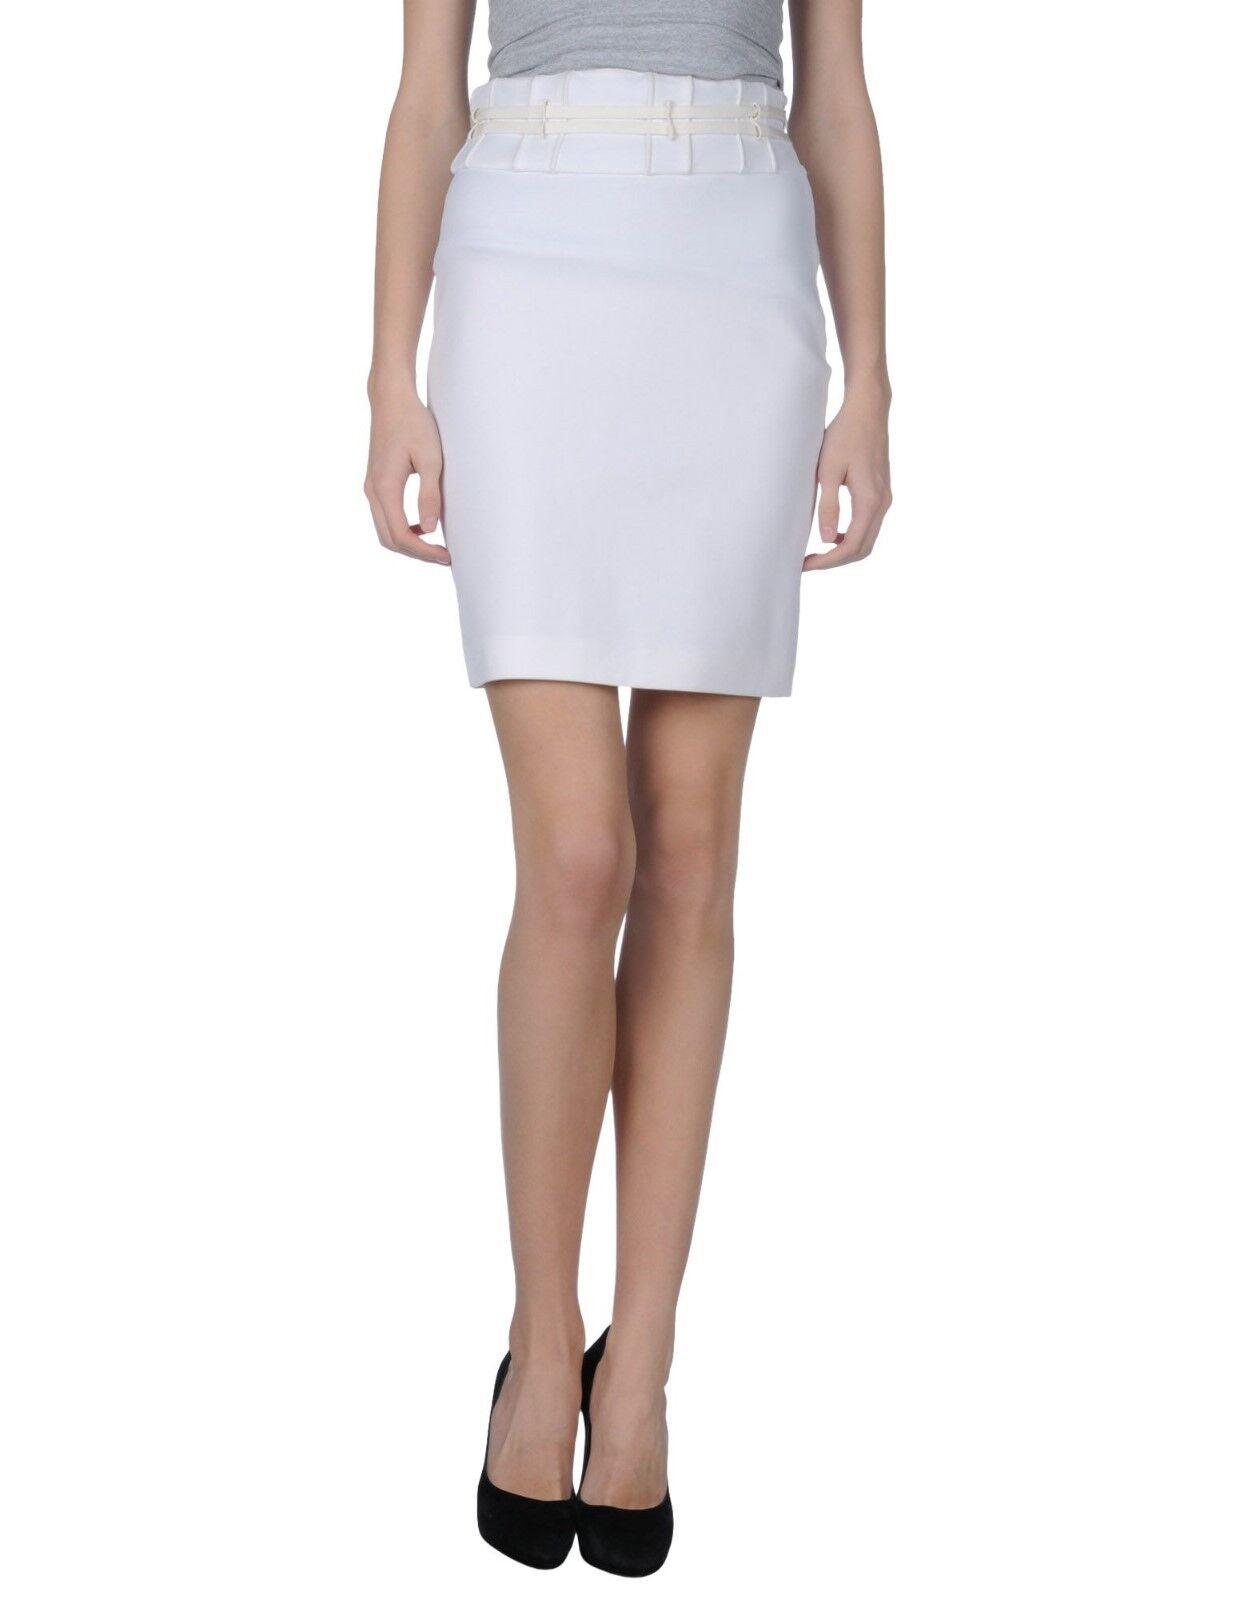 Robert Cavalli Warm White Knee Length Knitted Skirt  - Small